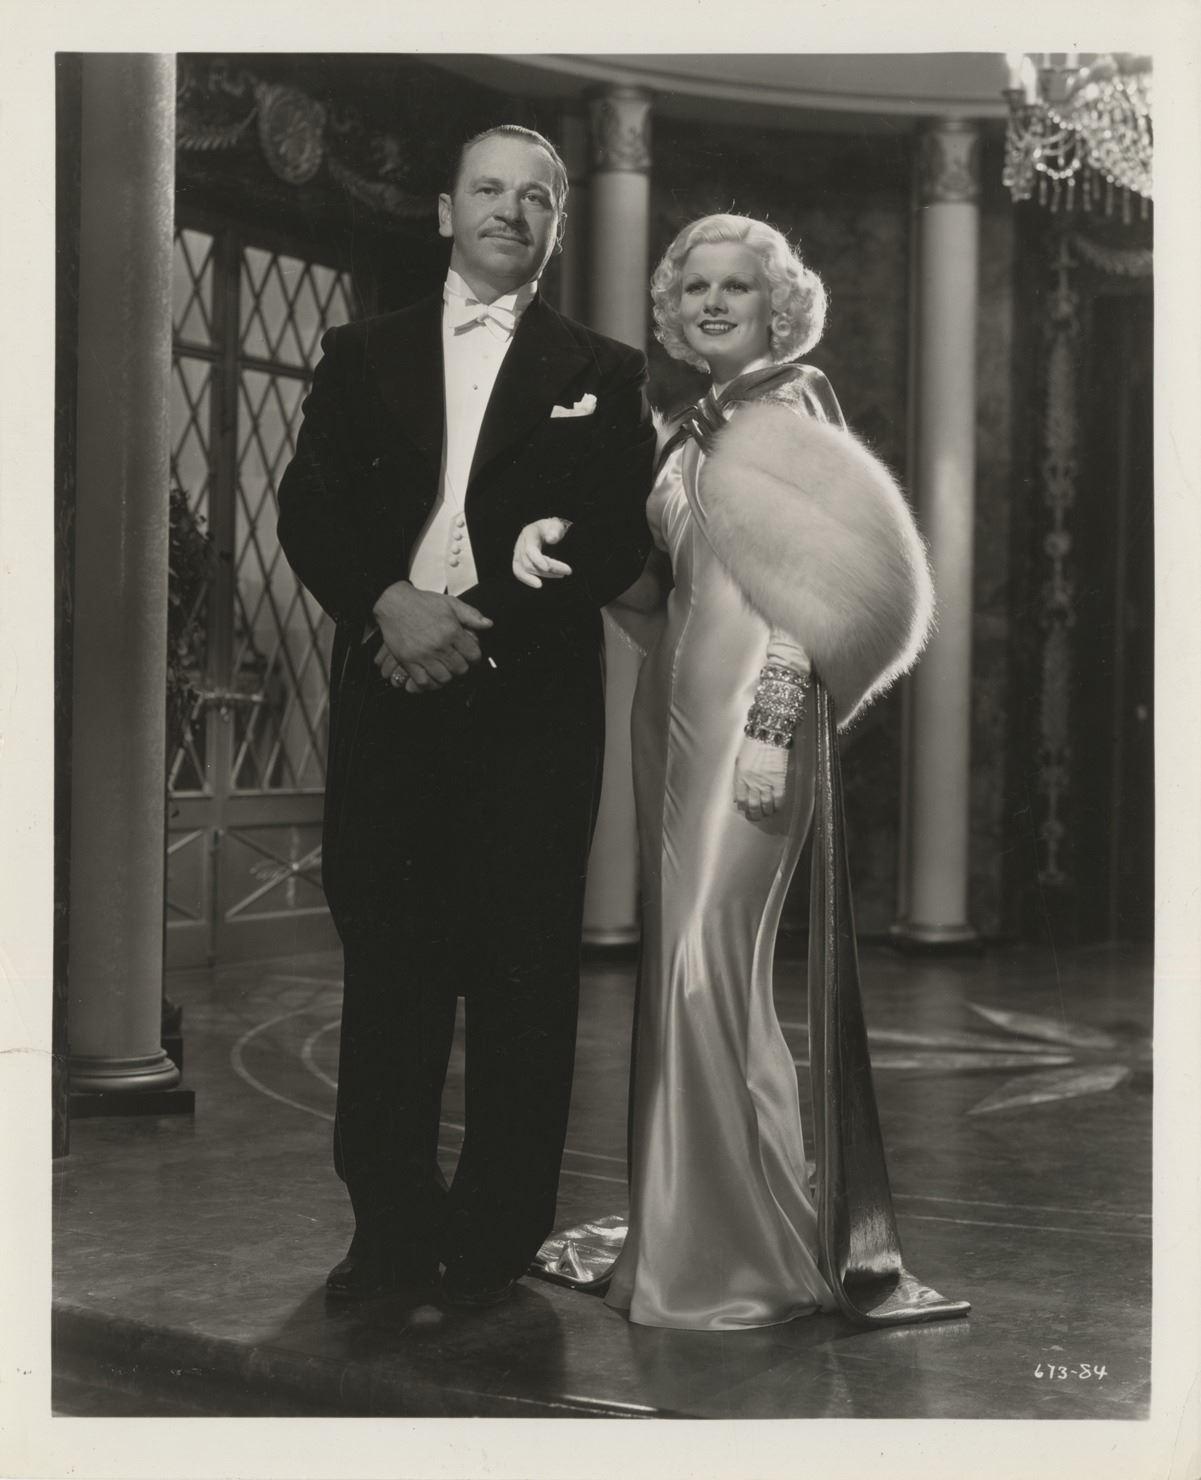 24 x 30 Jean Harlow Scene from a Film Black Office Uniform Photo Print